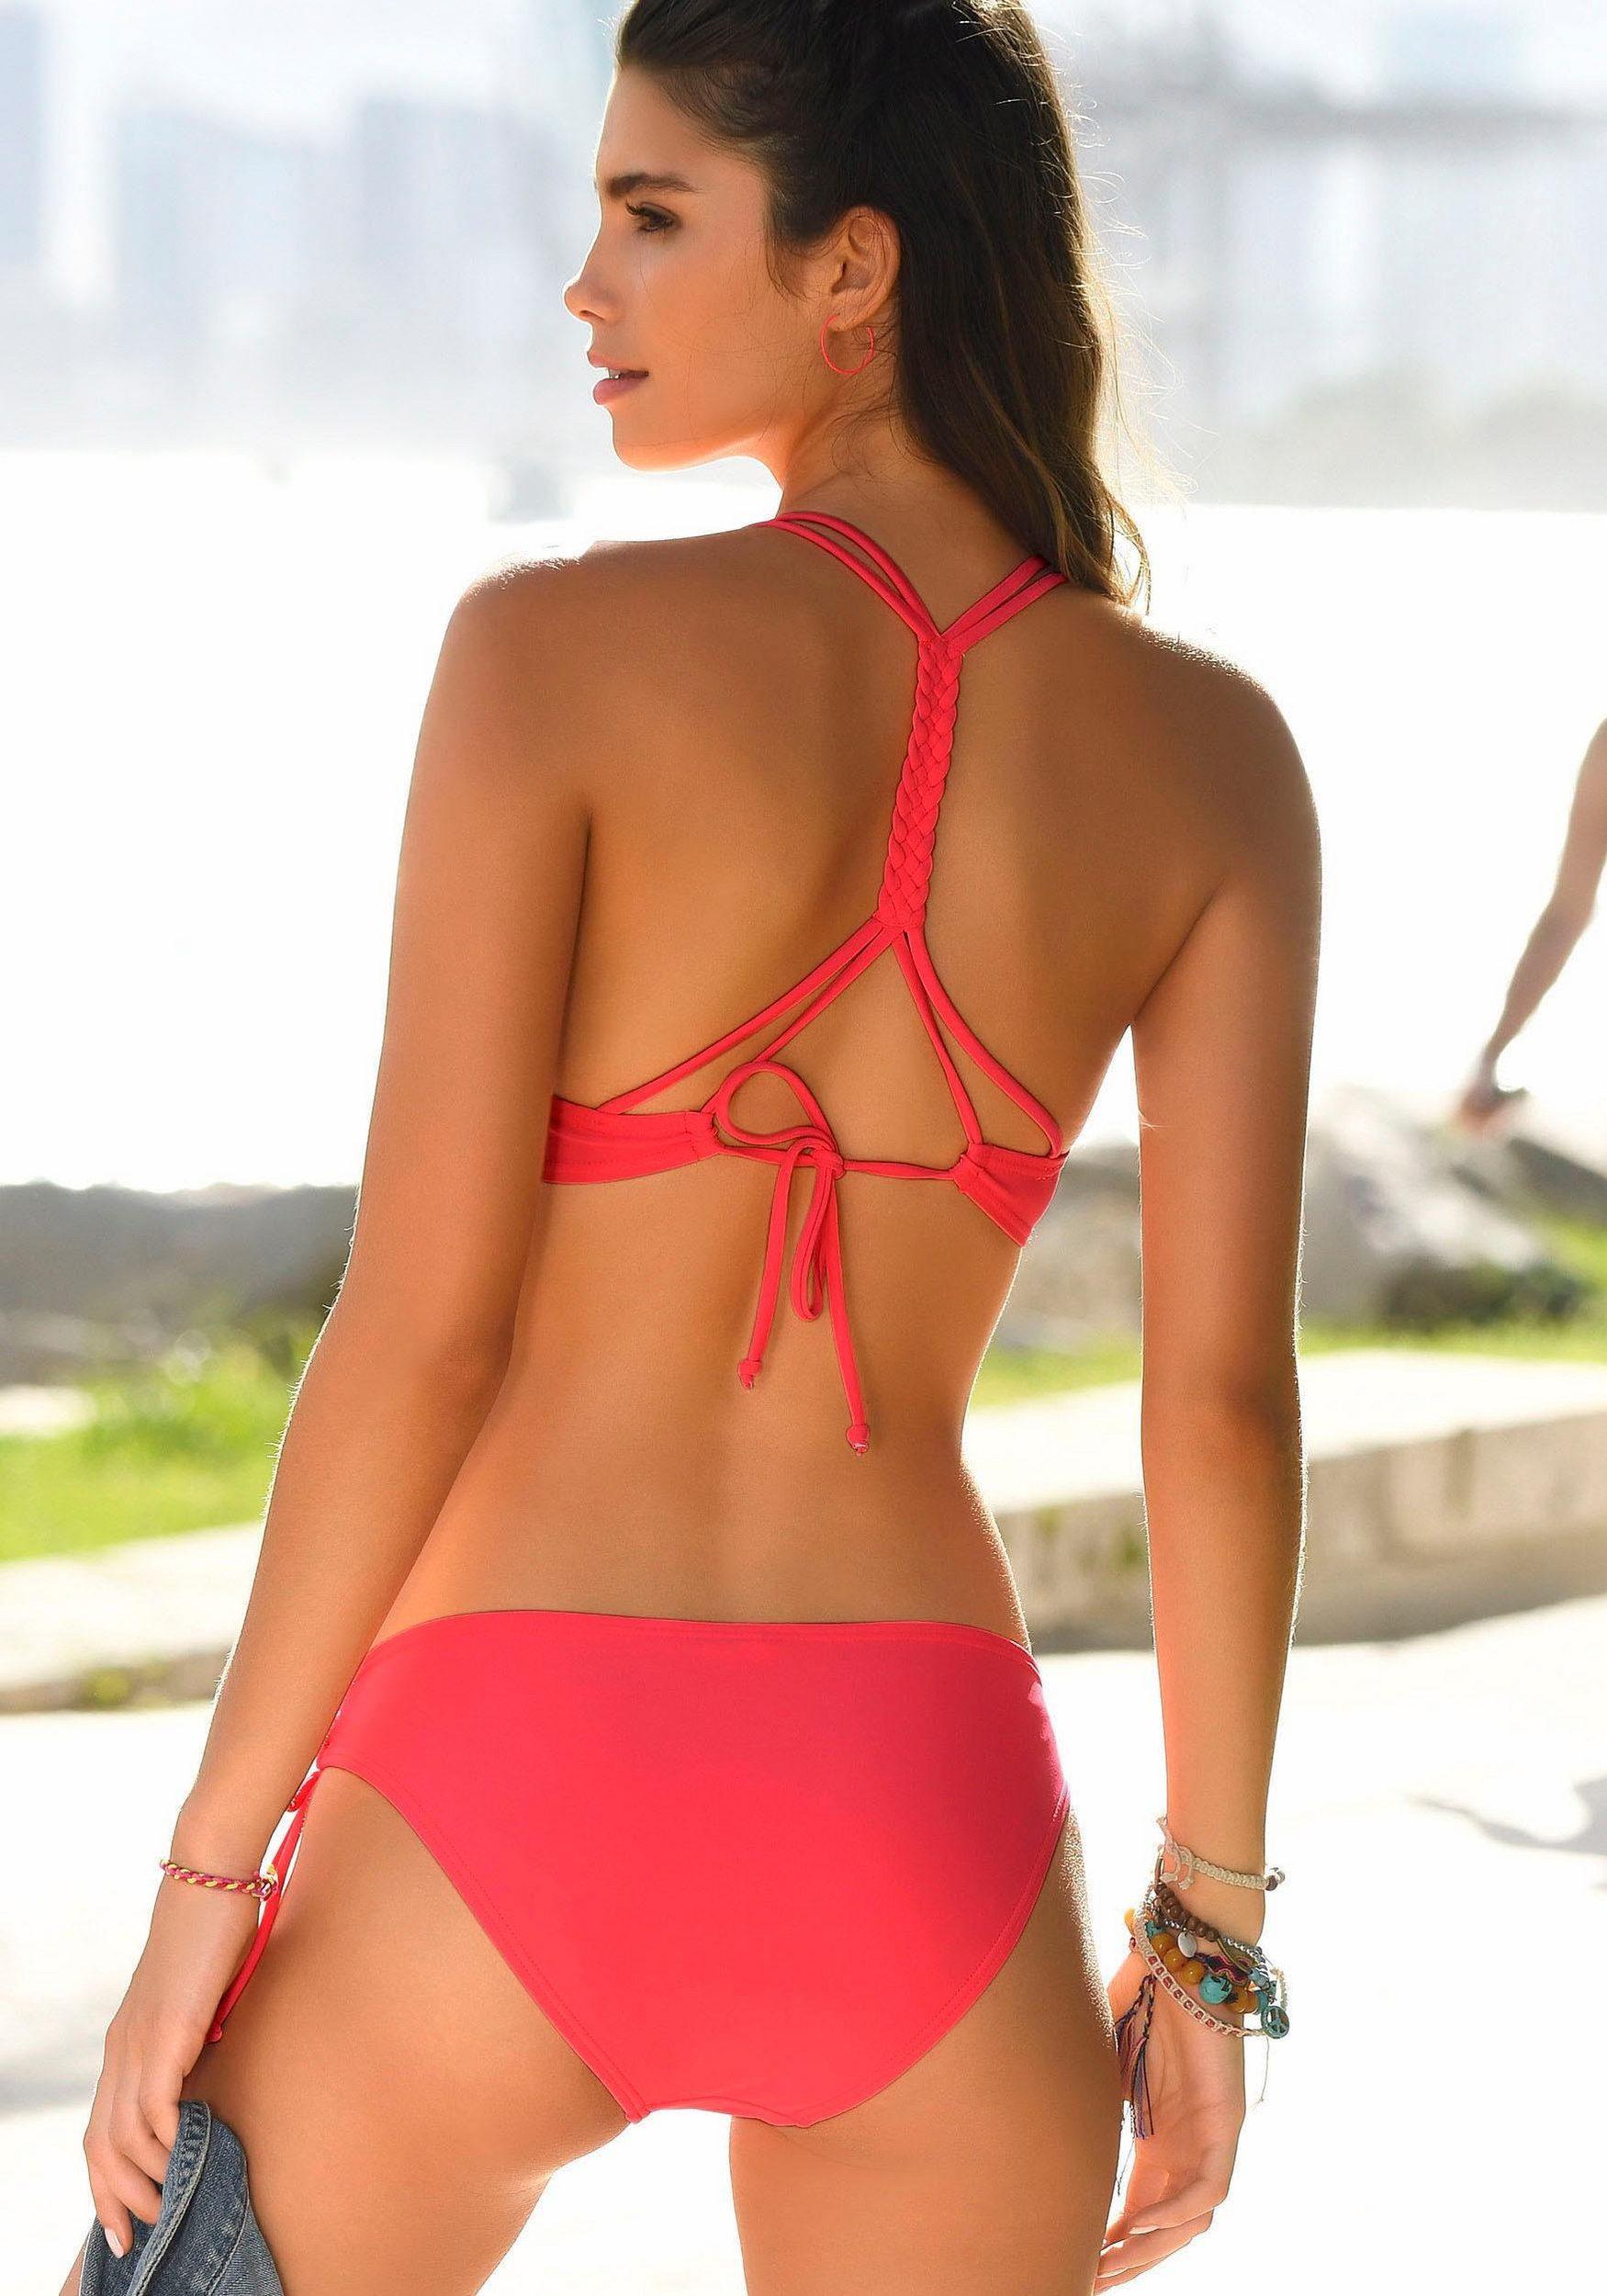 Welcher Bikini